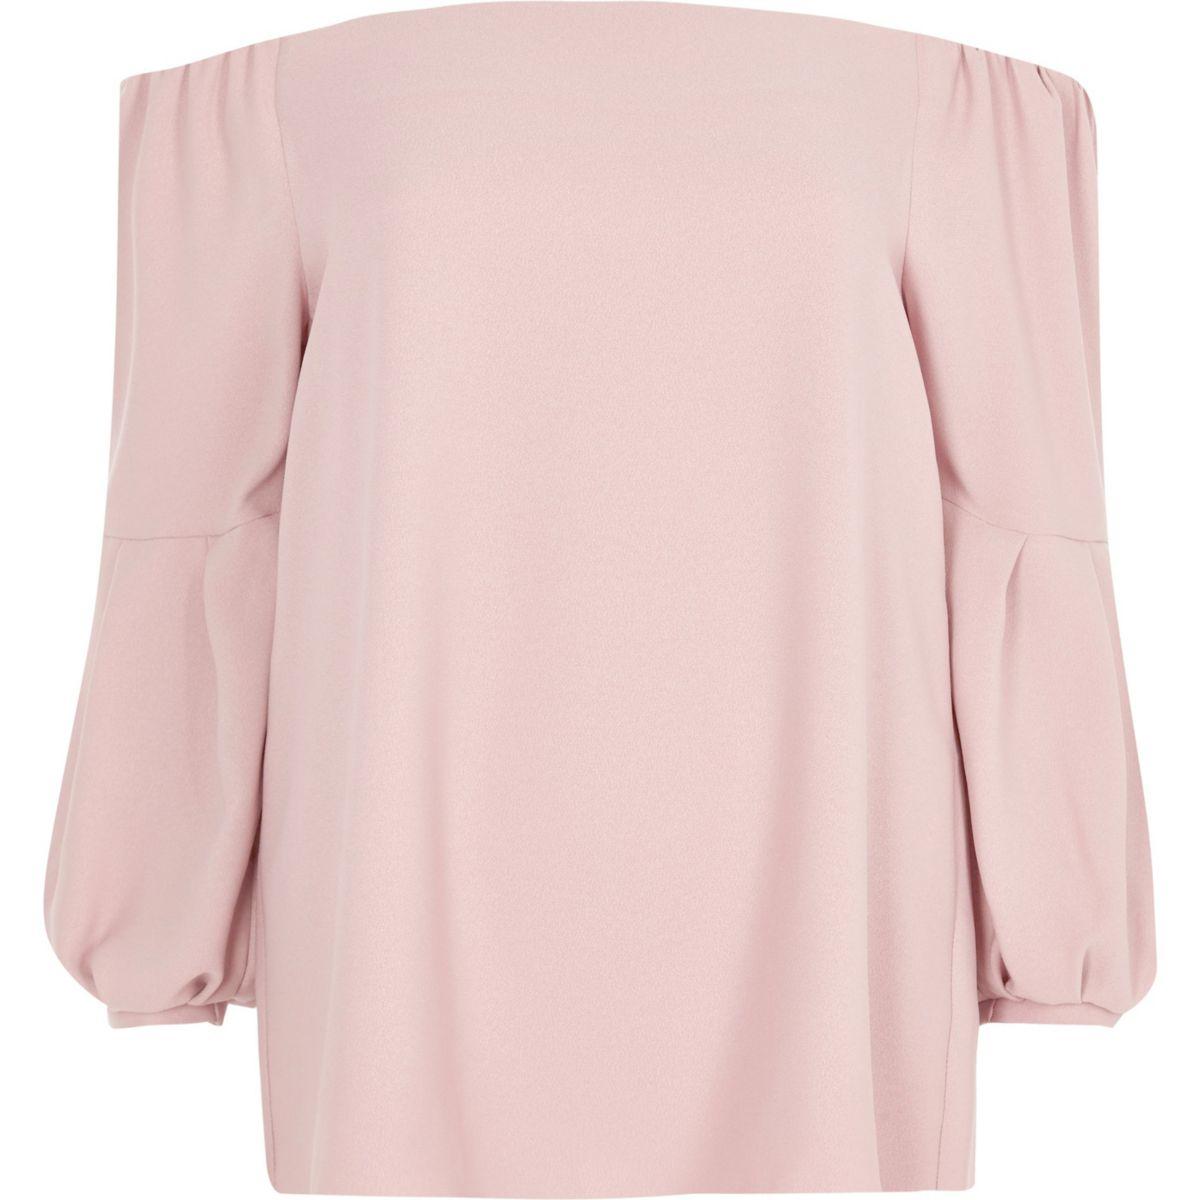 Pink bardot puff long sleeve top